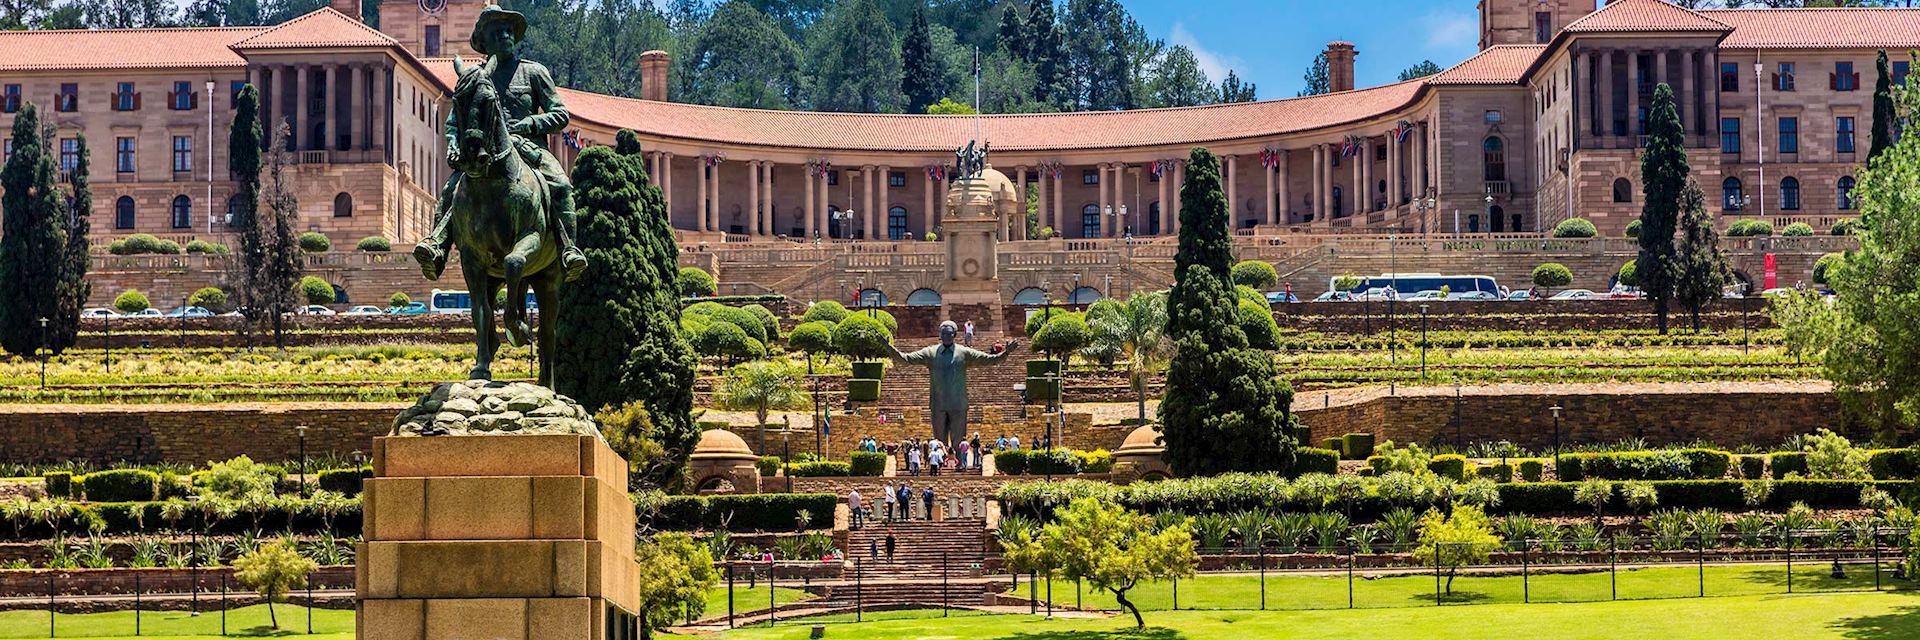 Pretoria's Union Building